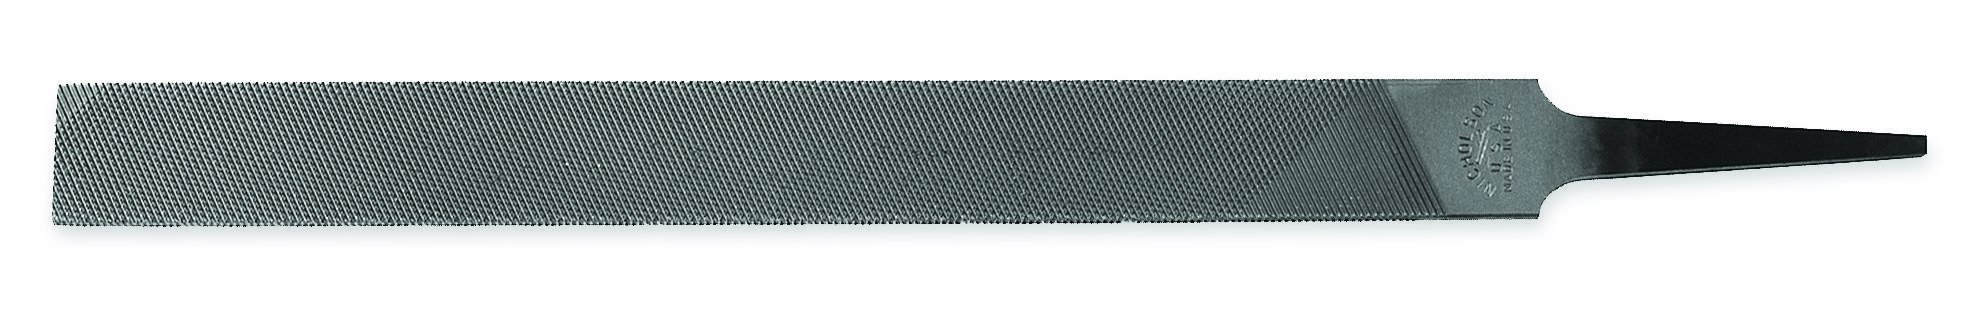 Nicholson 06117N FILE,12'',HAND 2ND CUT,305mm